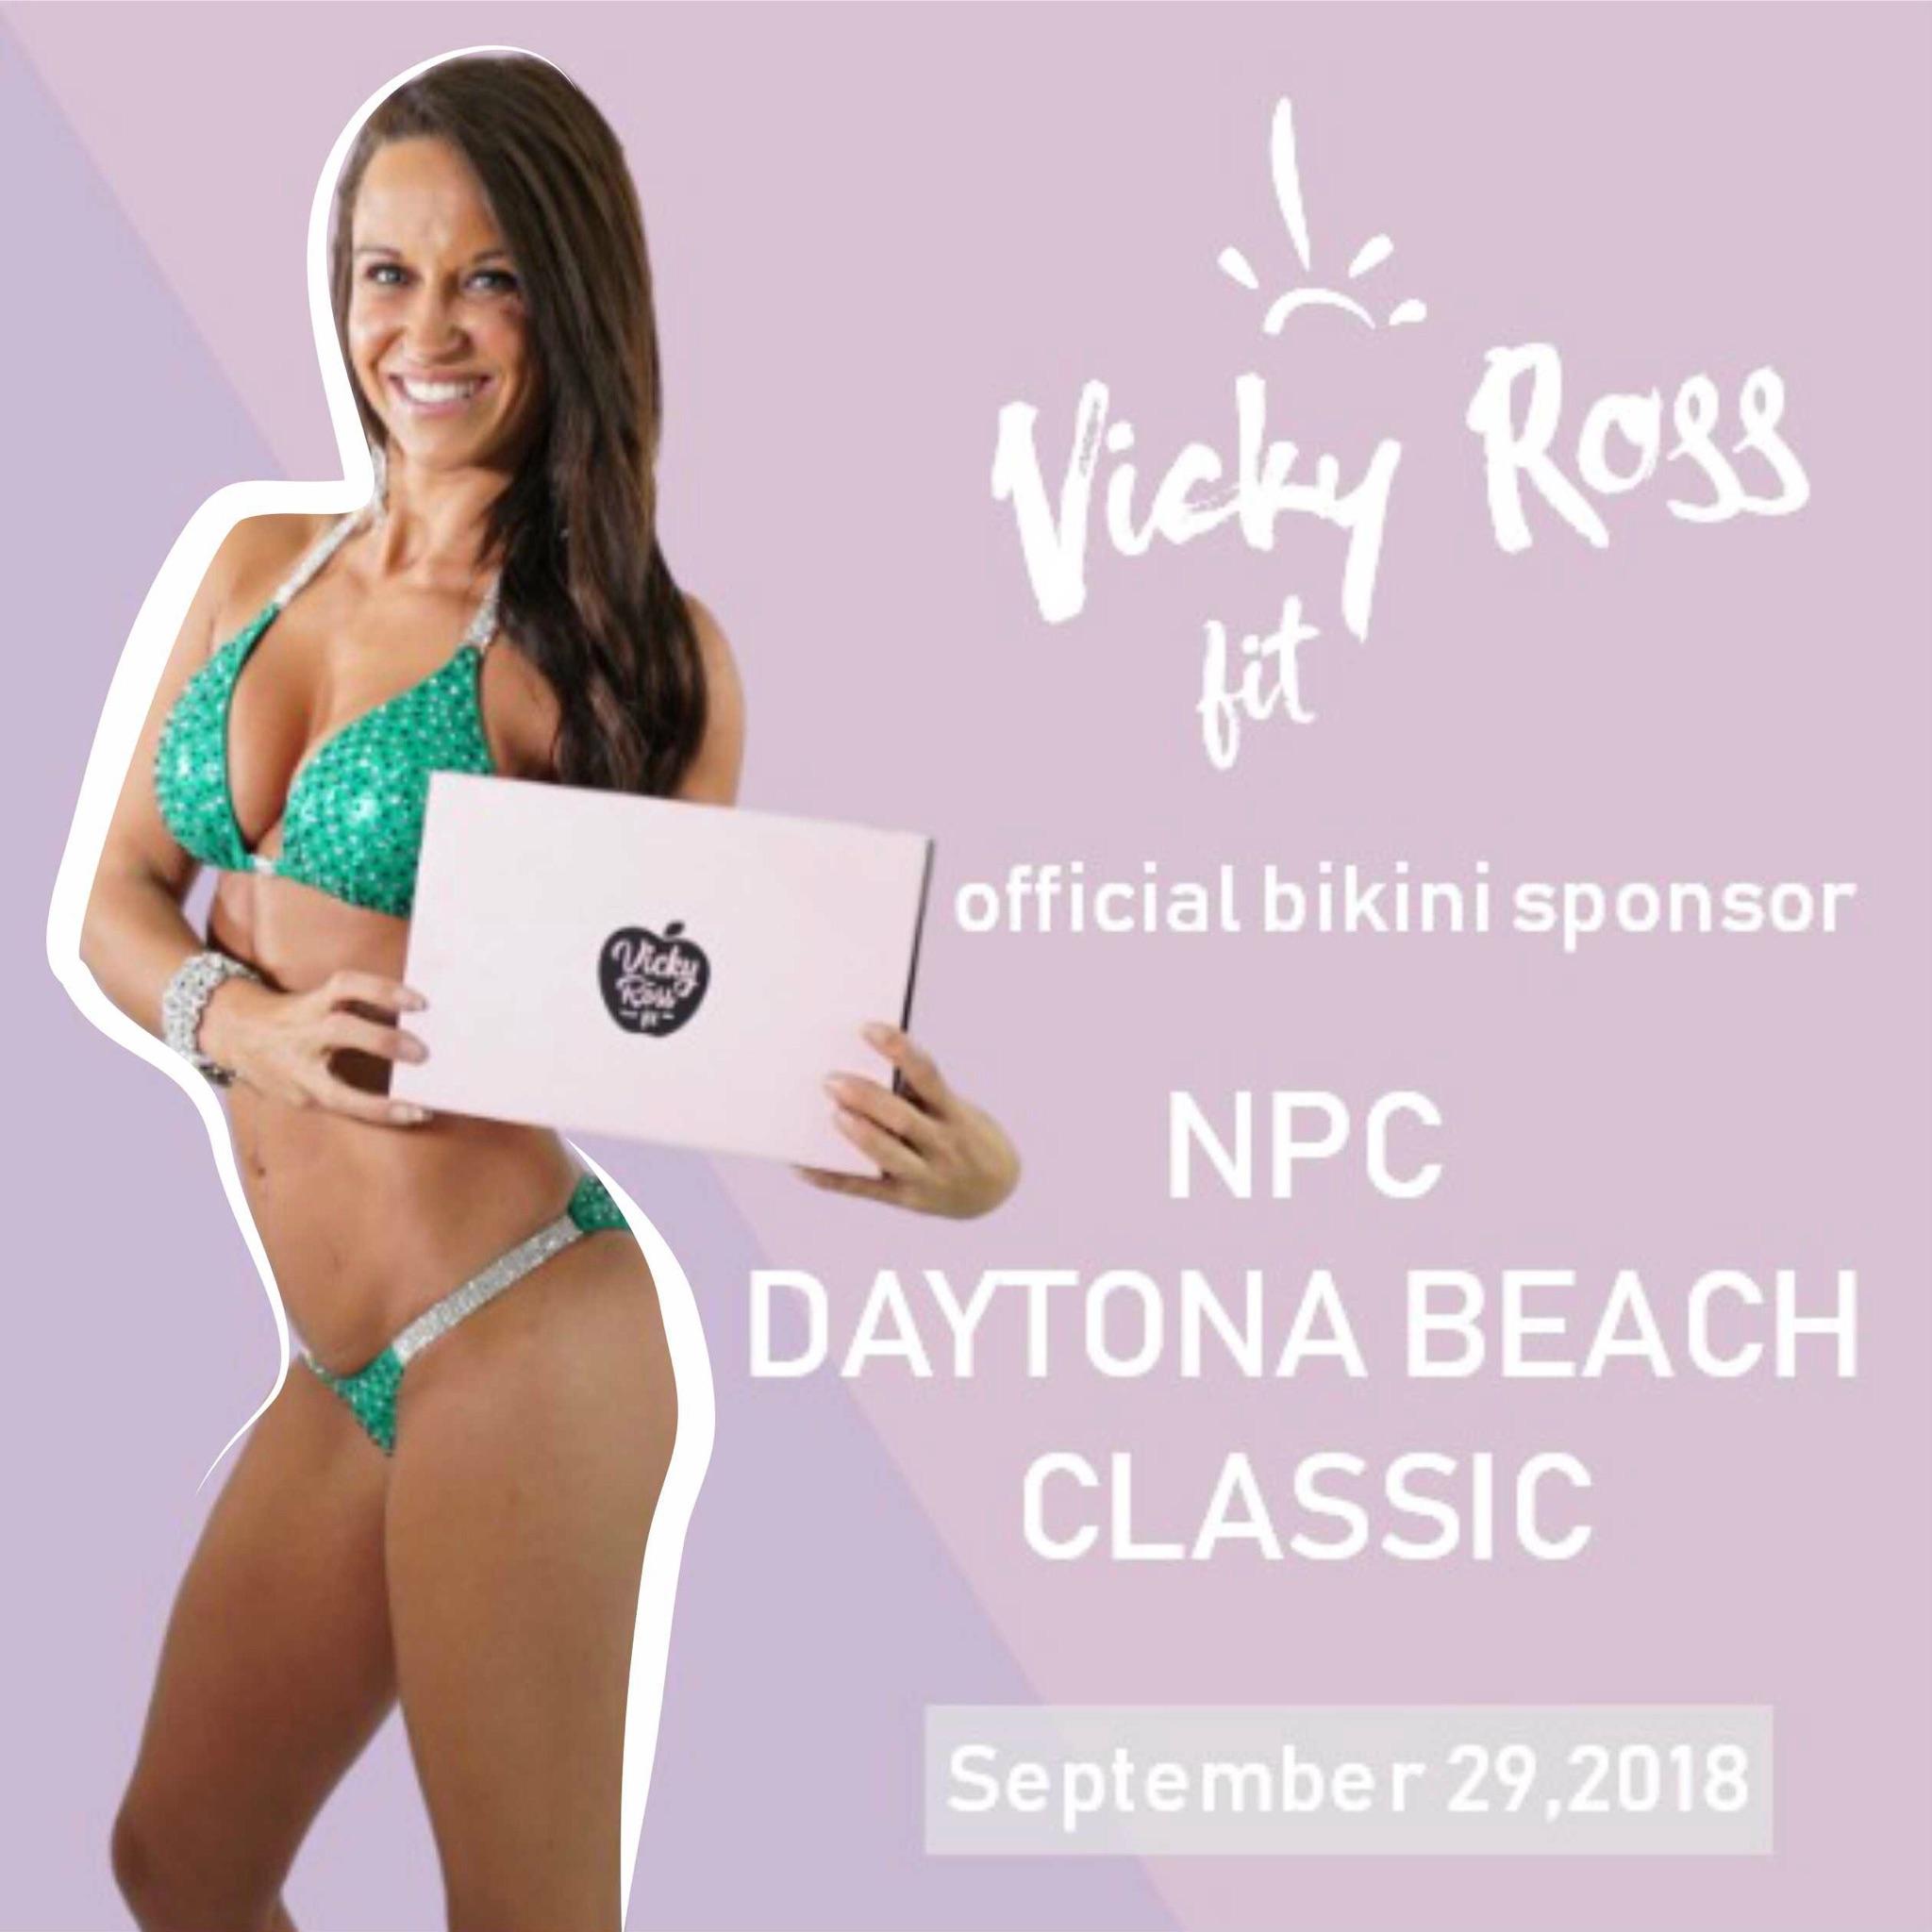 GAYTONA BEACH CLASSIC SPONSOR 1